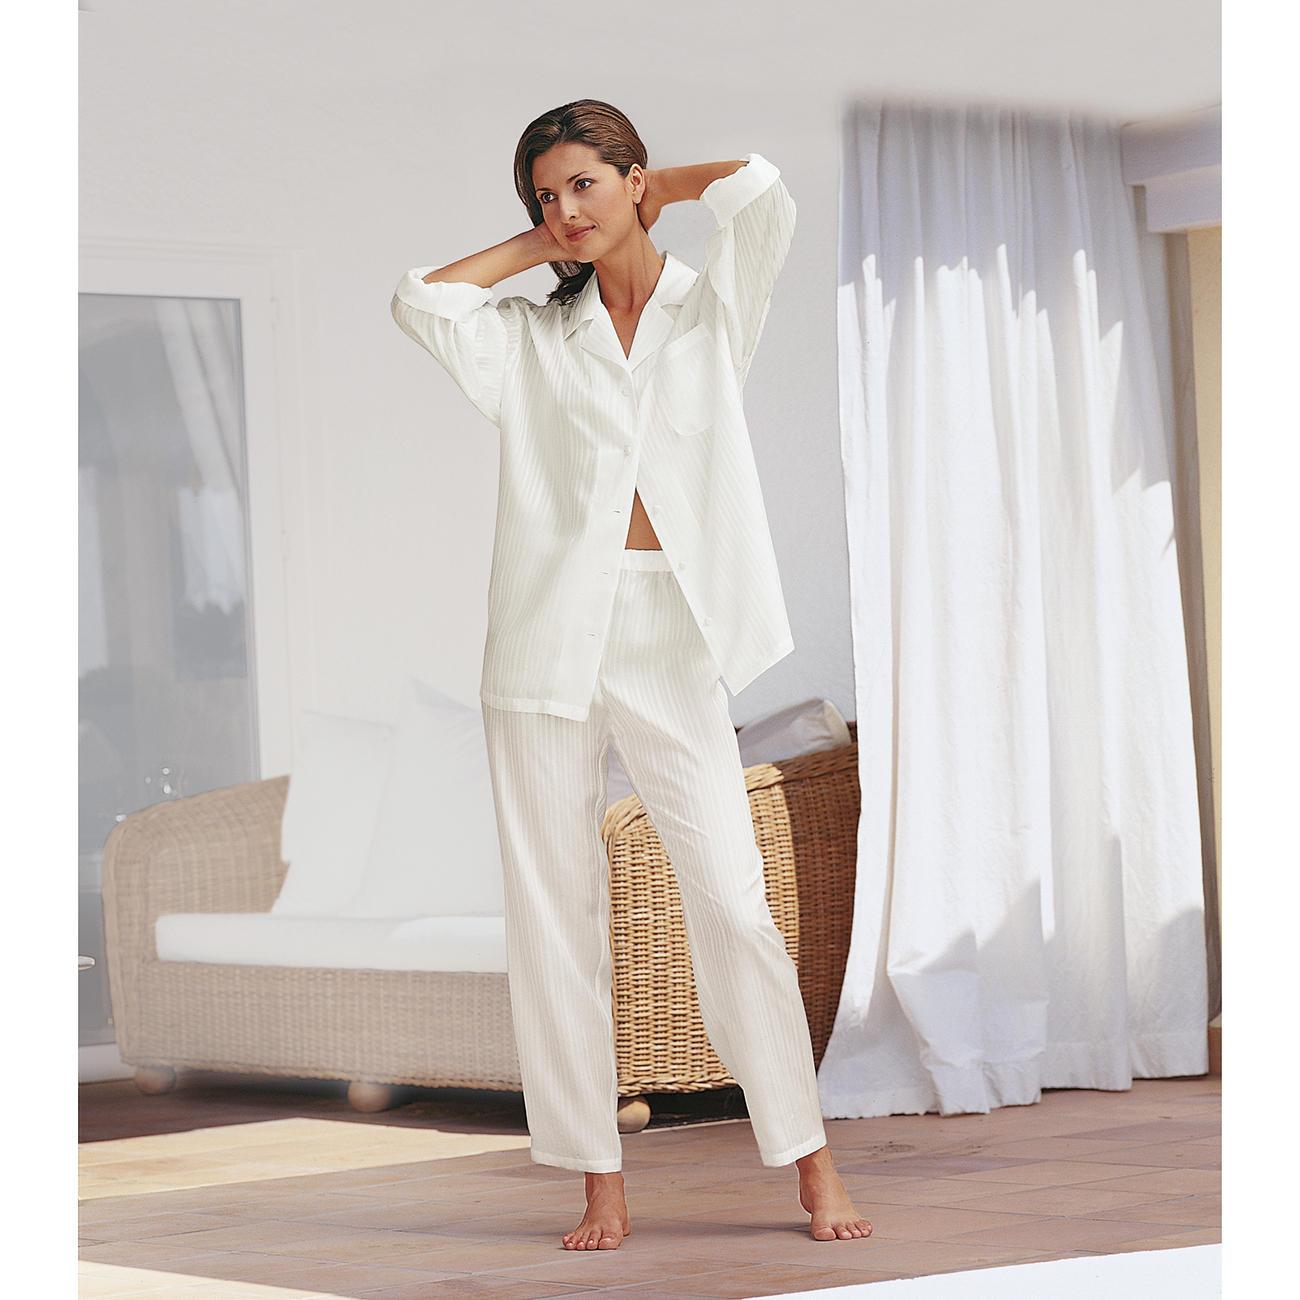 best service 55c7c 227ce Seiden-Pyjama mit Etui | Mode-Klassiker entdecken